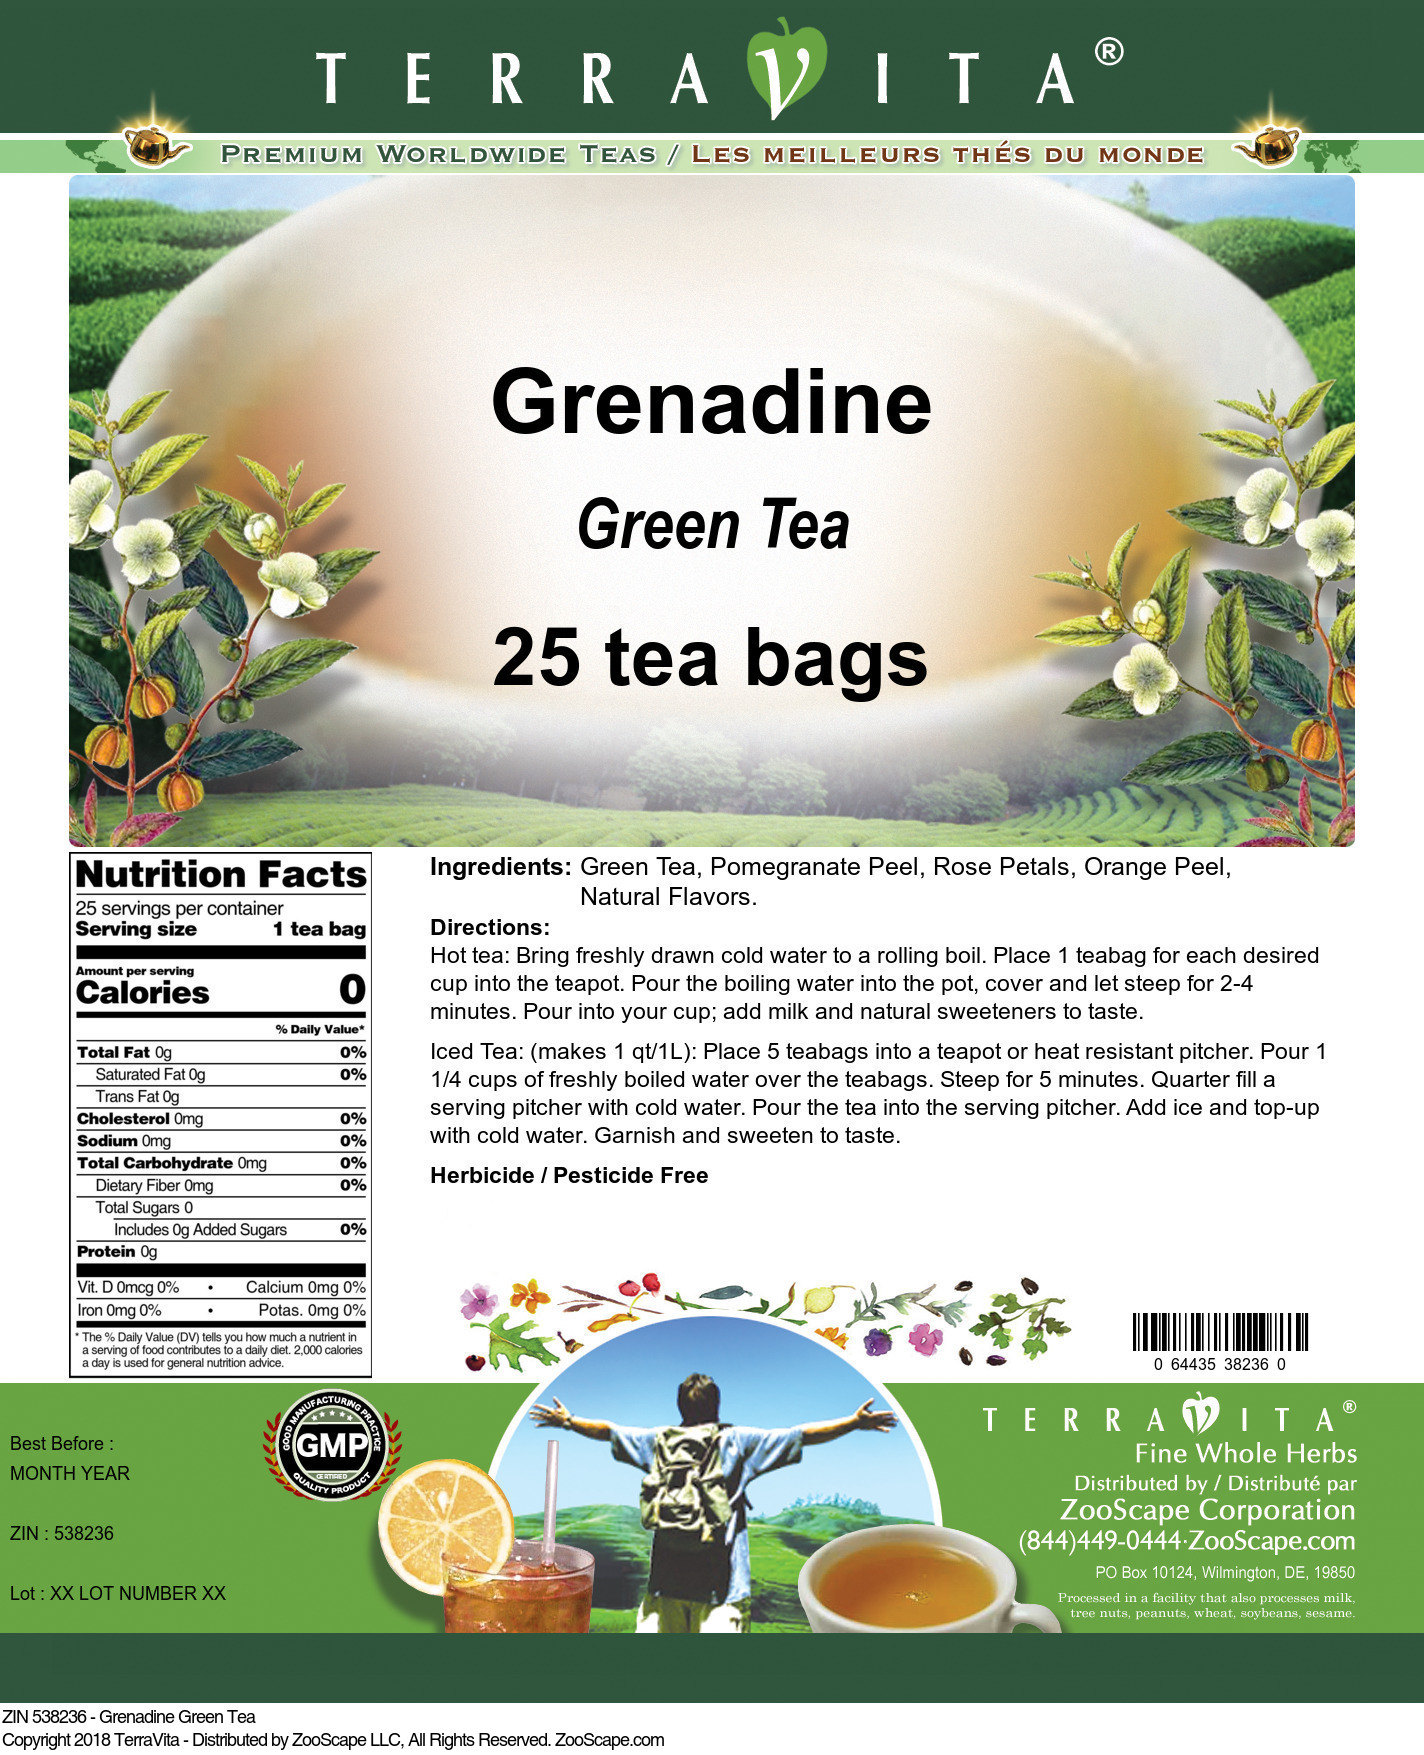 Grenadine Green Tea